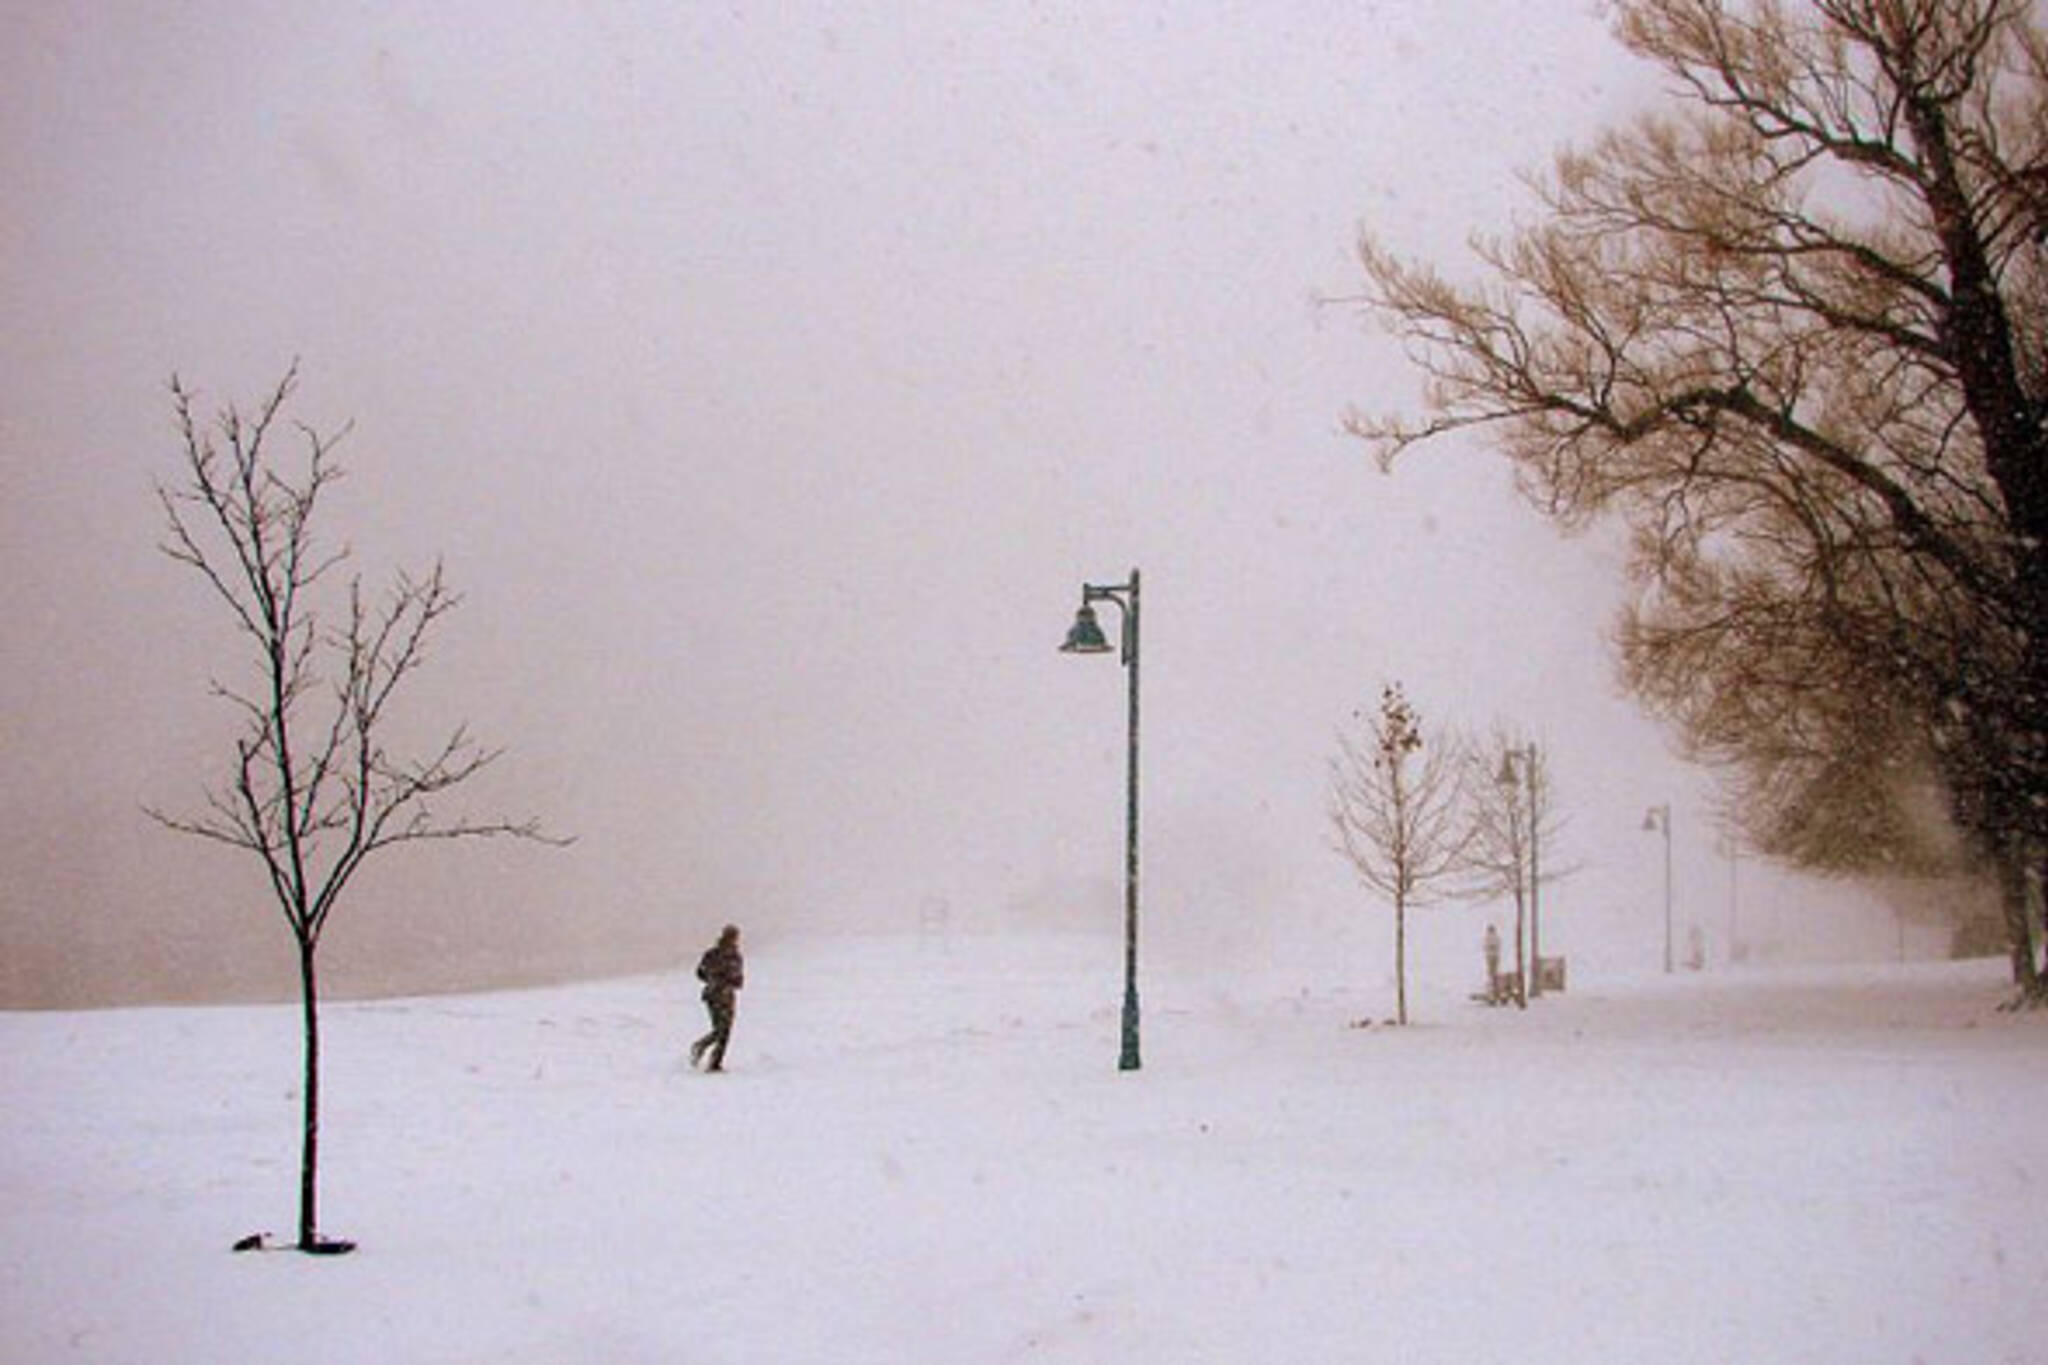 winter jogger